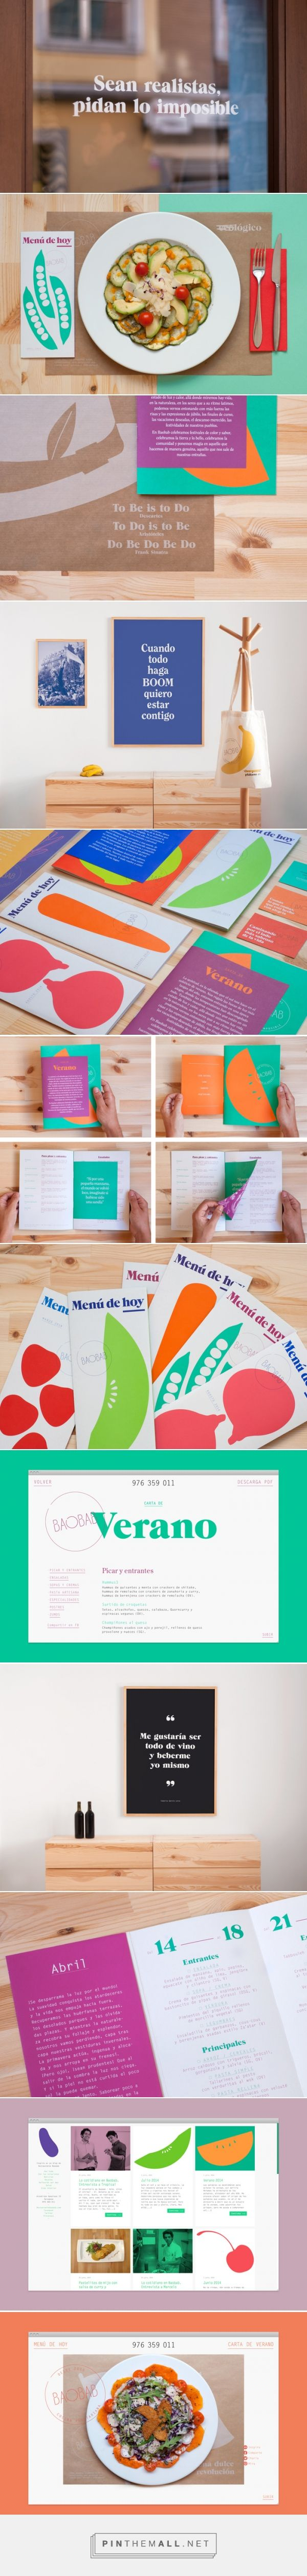 Baobab restaurant branding - Fonts In Use...